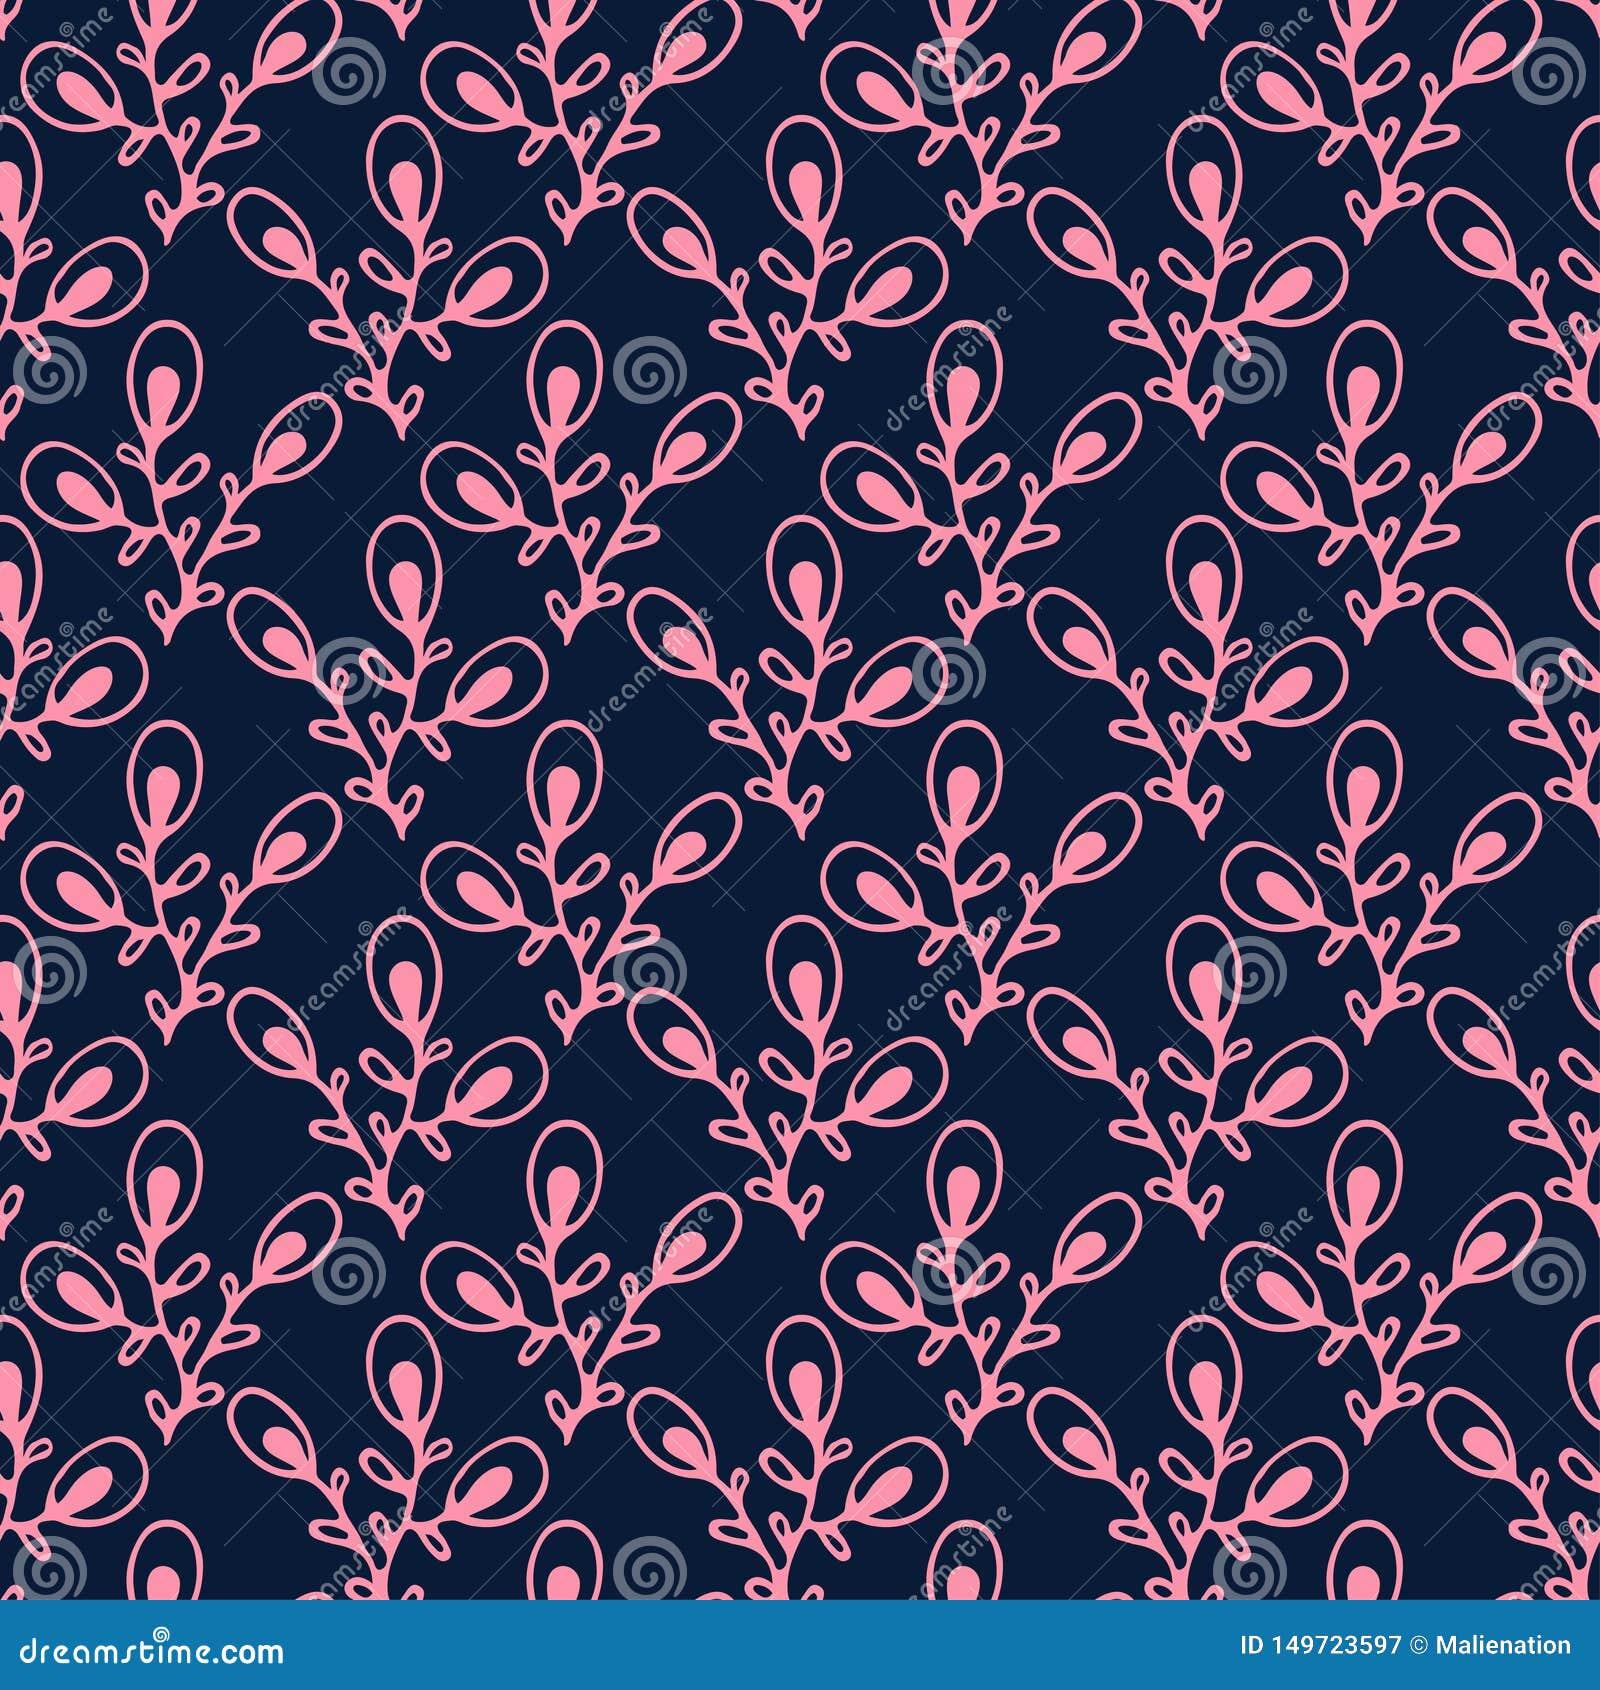 Vintage Wallpaper Background Floral Seamless Pattern Minimalist